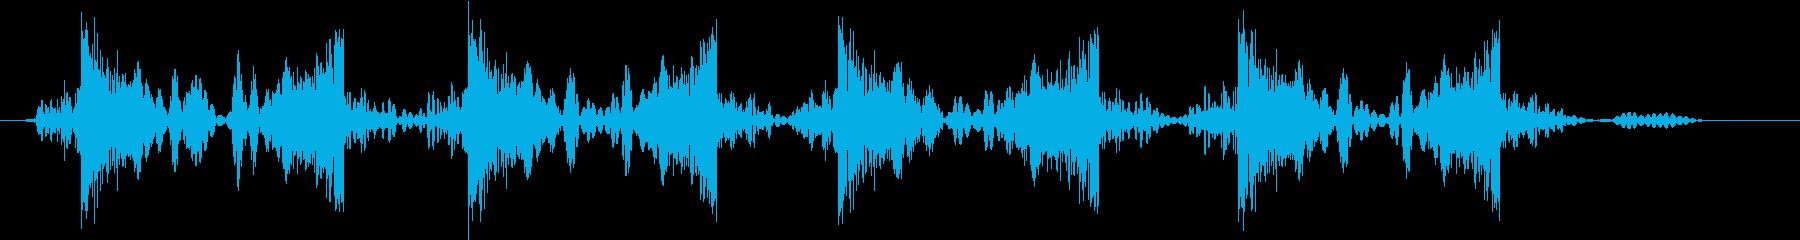 ジュクジュクジュクジュクの再生済みの波形